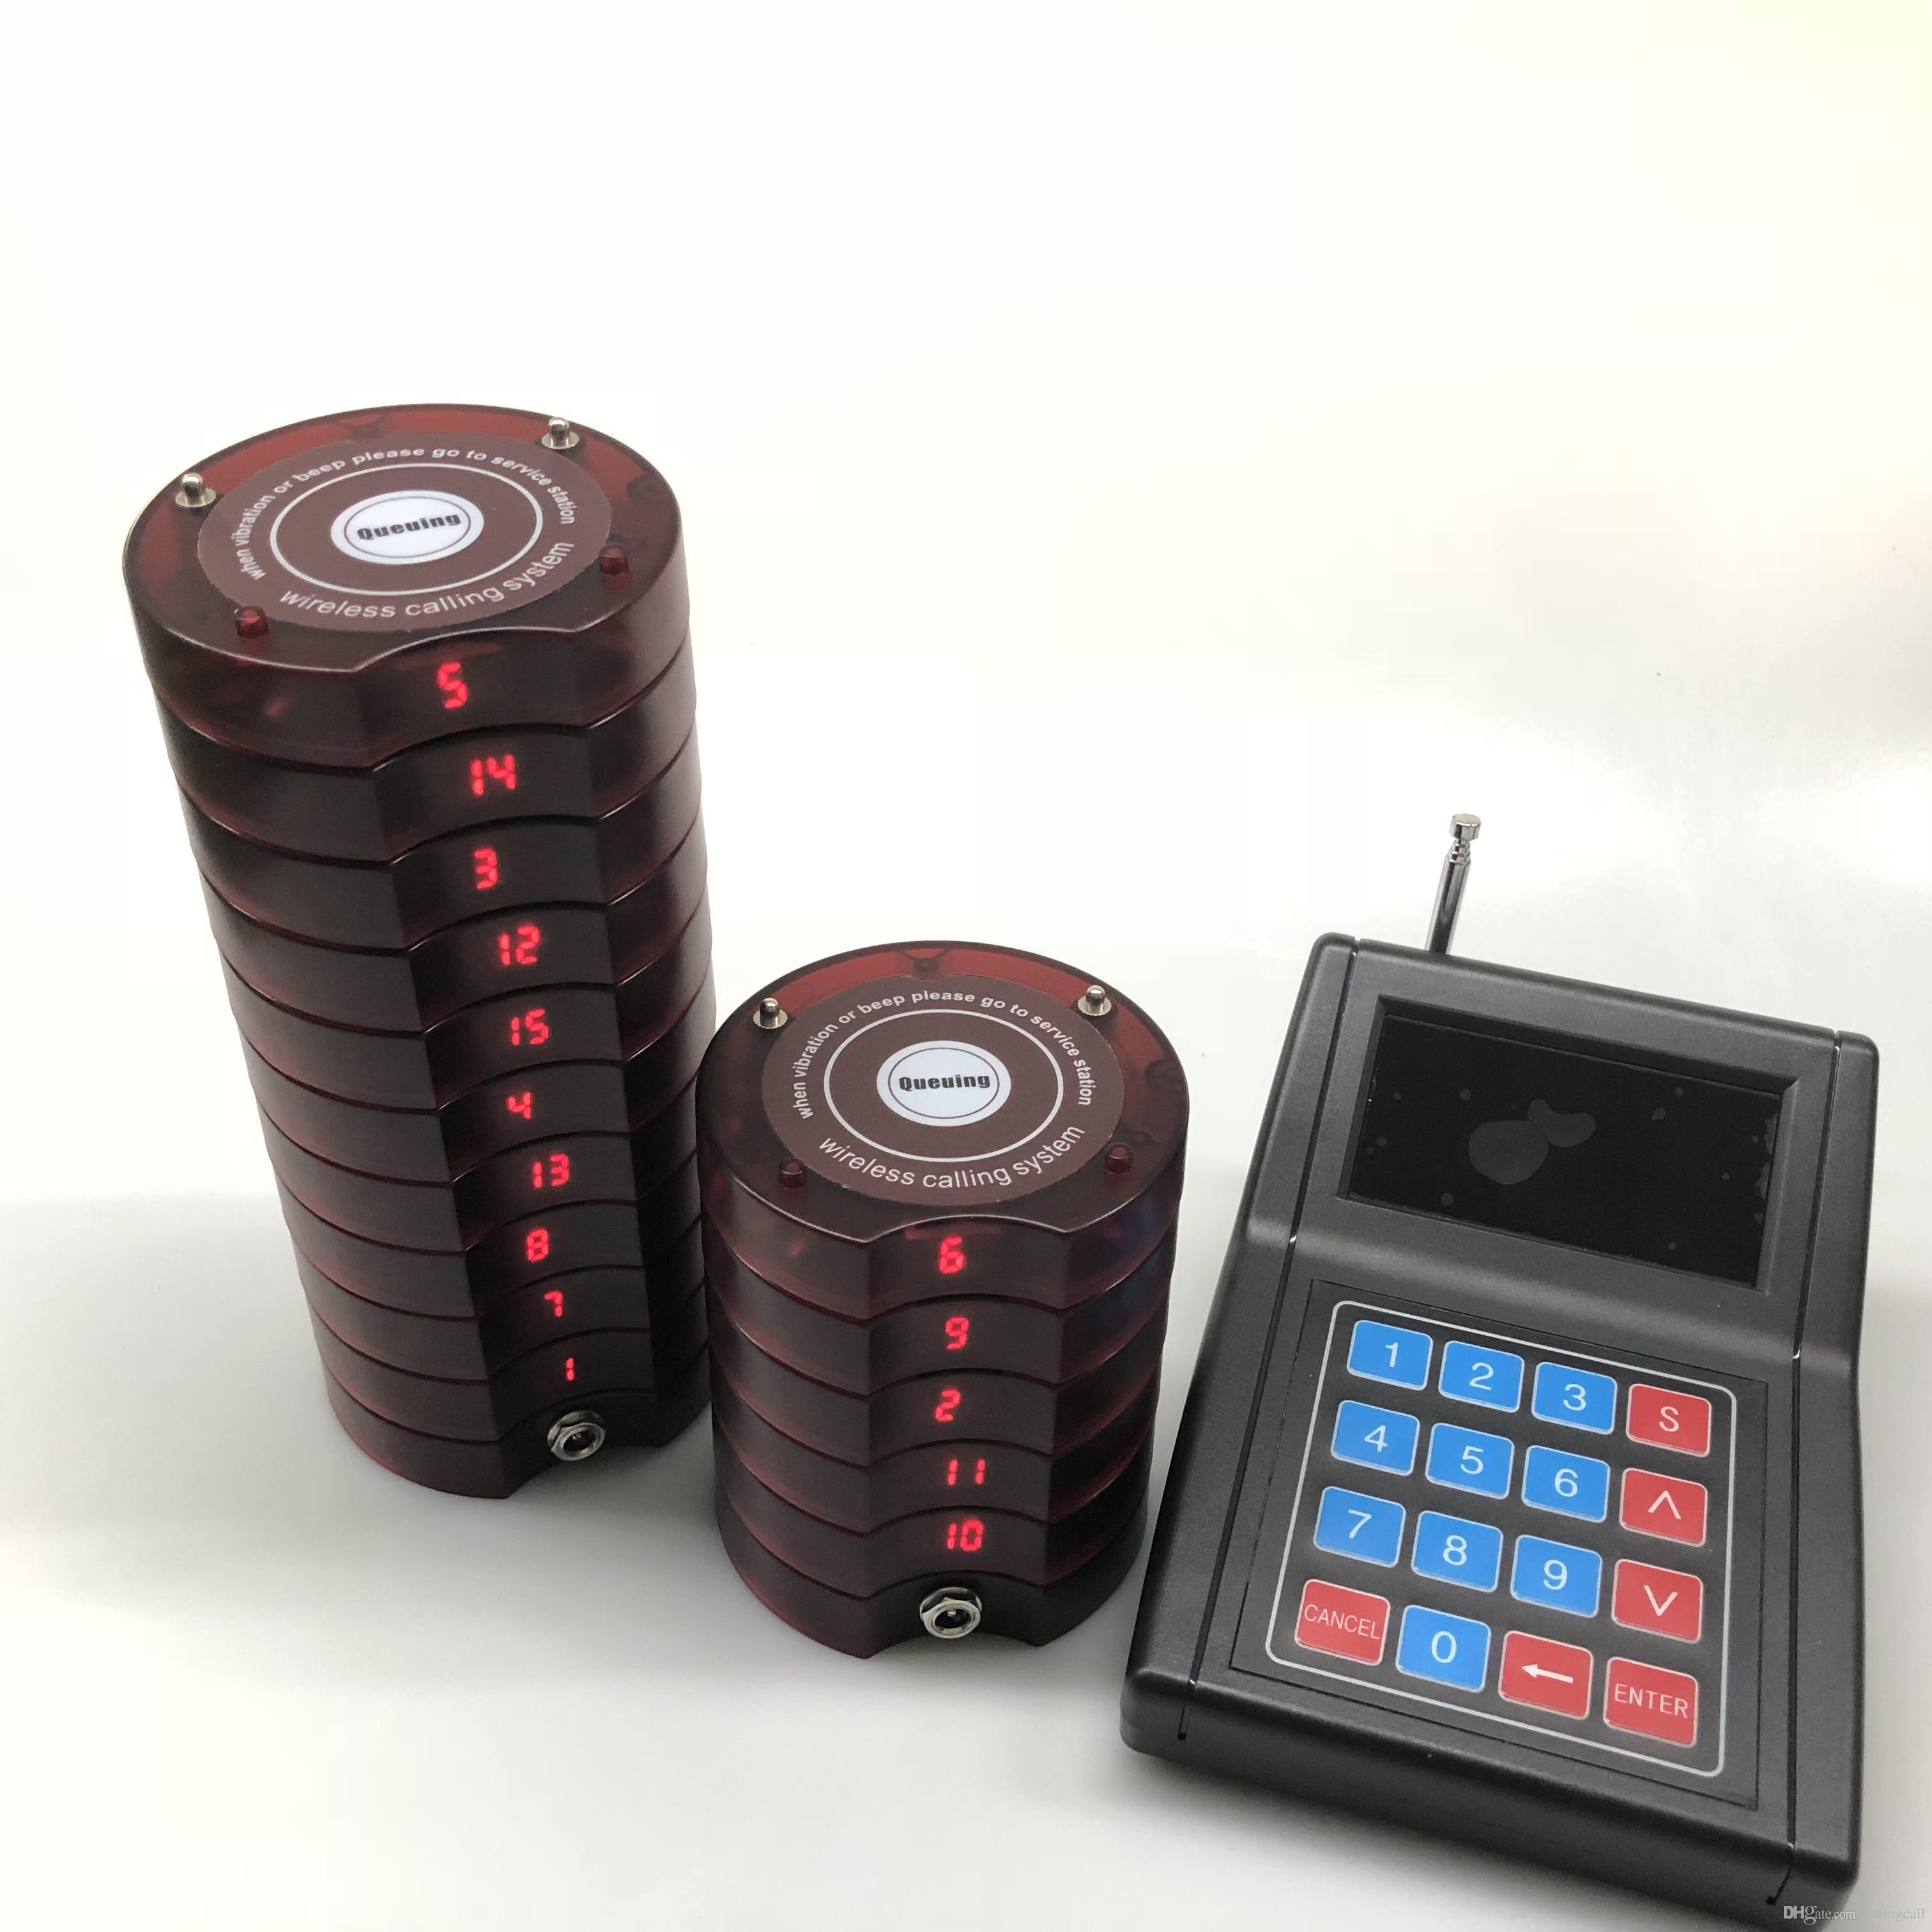 Acquista 15 Call Coaster Pager + 1 Keypad Transmitter Sistema Di Chiamata  Cercapersone Wireless Ristorante Food Court Coffee Shop Hotel A  200.0 Dal  ... 9eac94f8a354